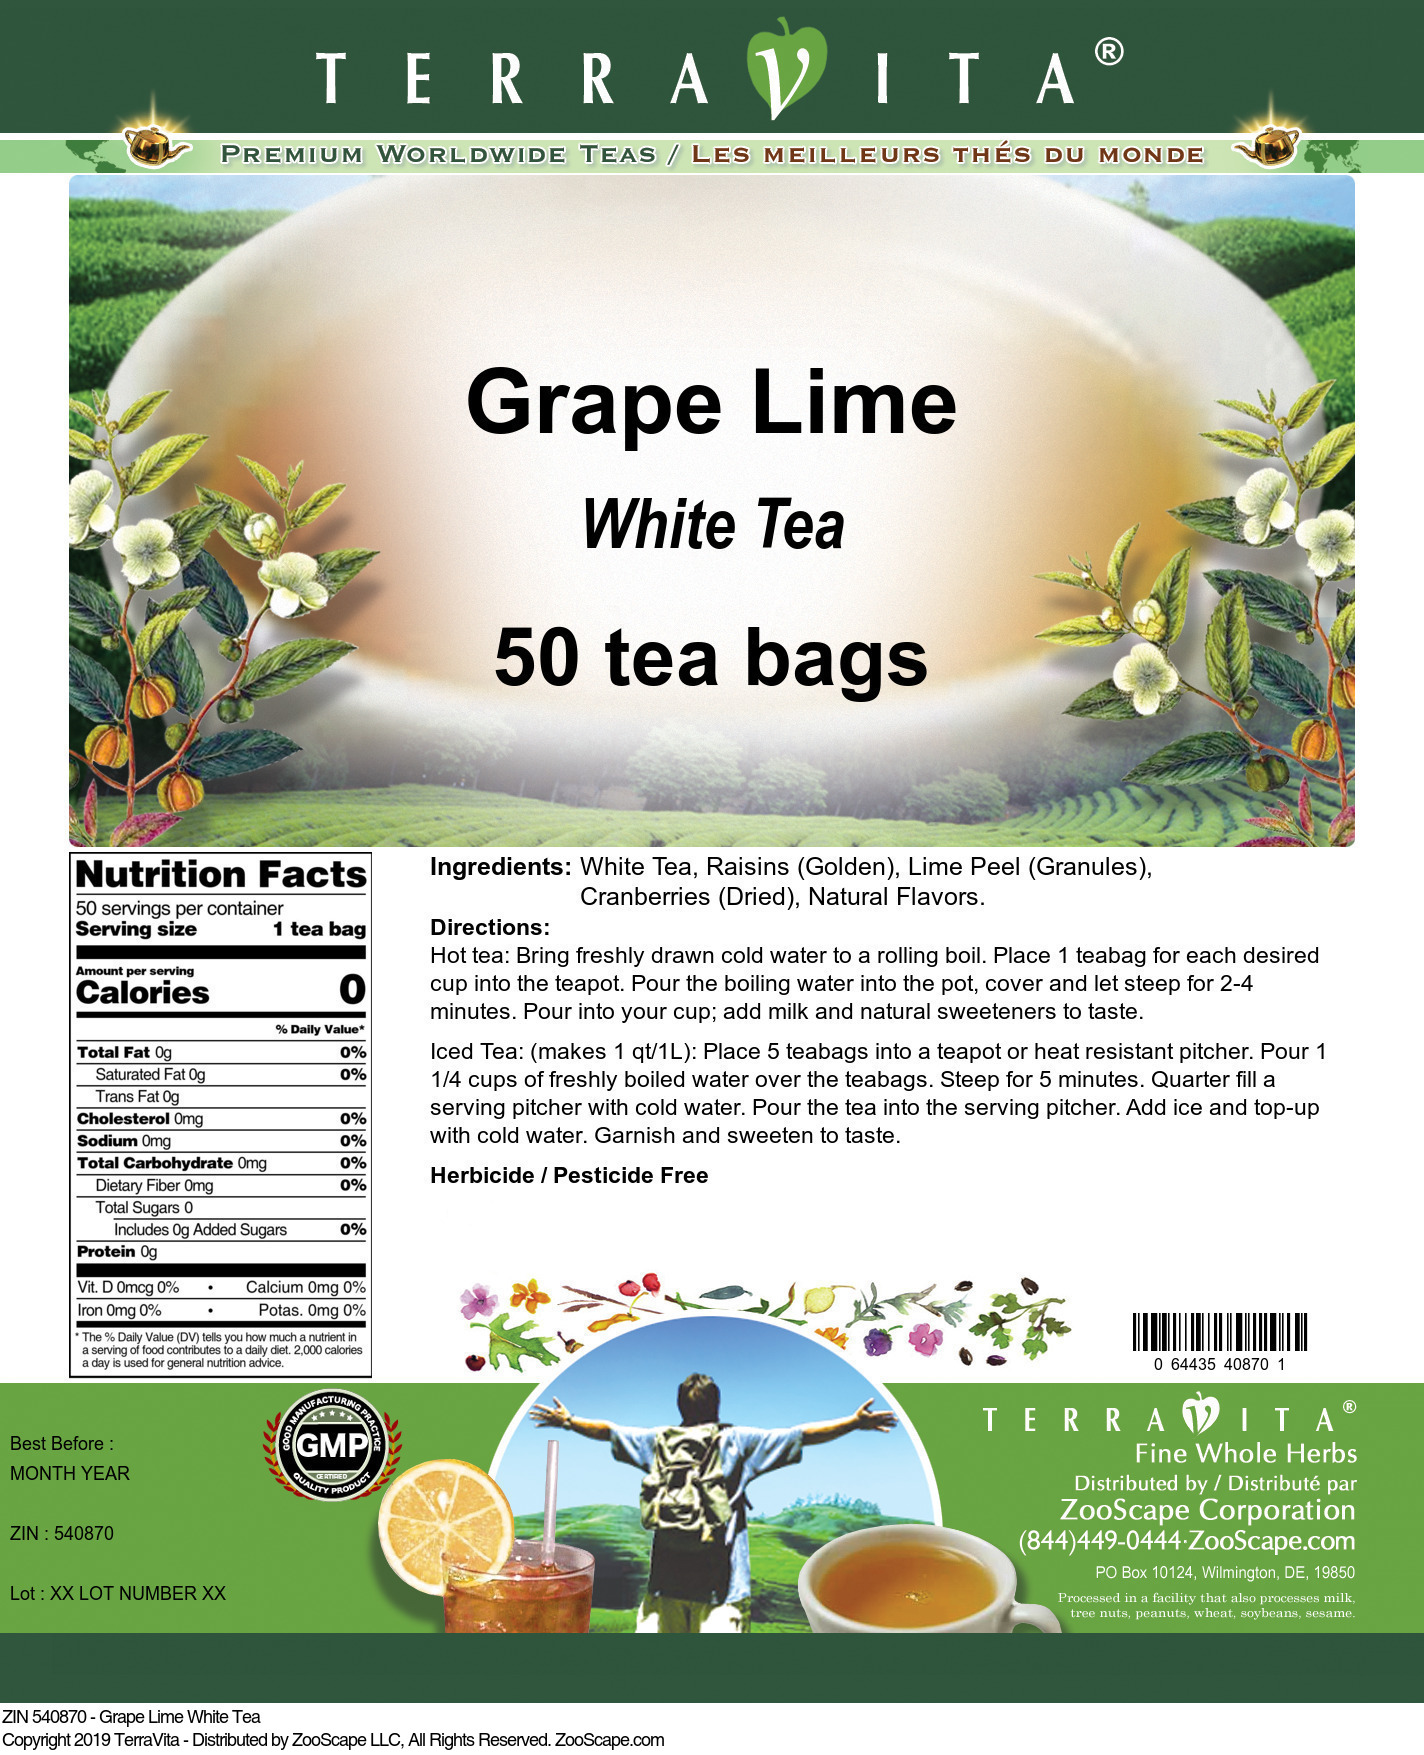 Grape Lime White Tea